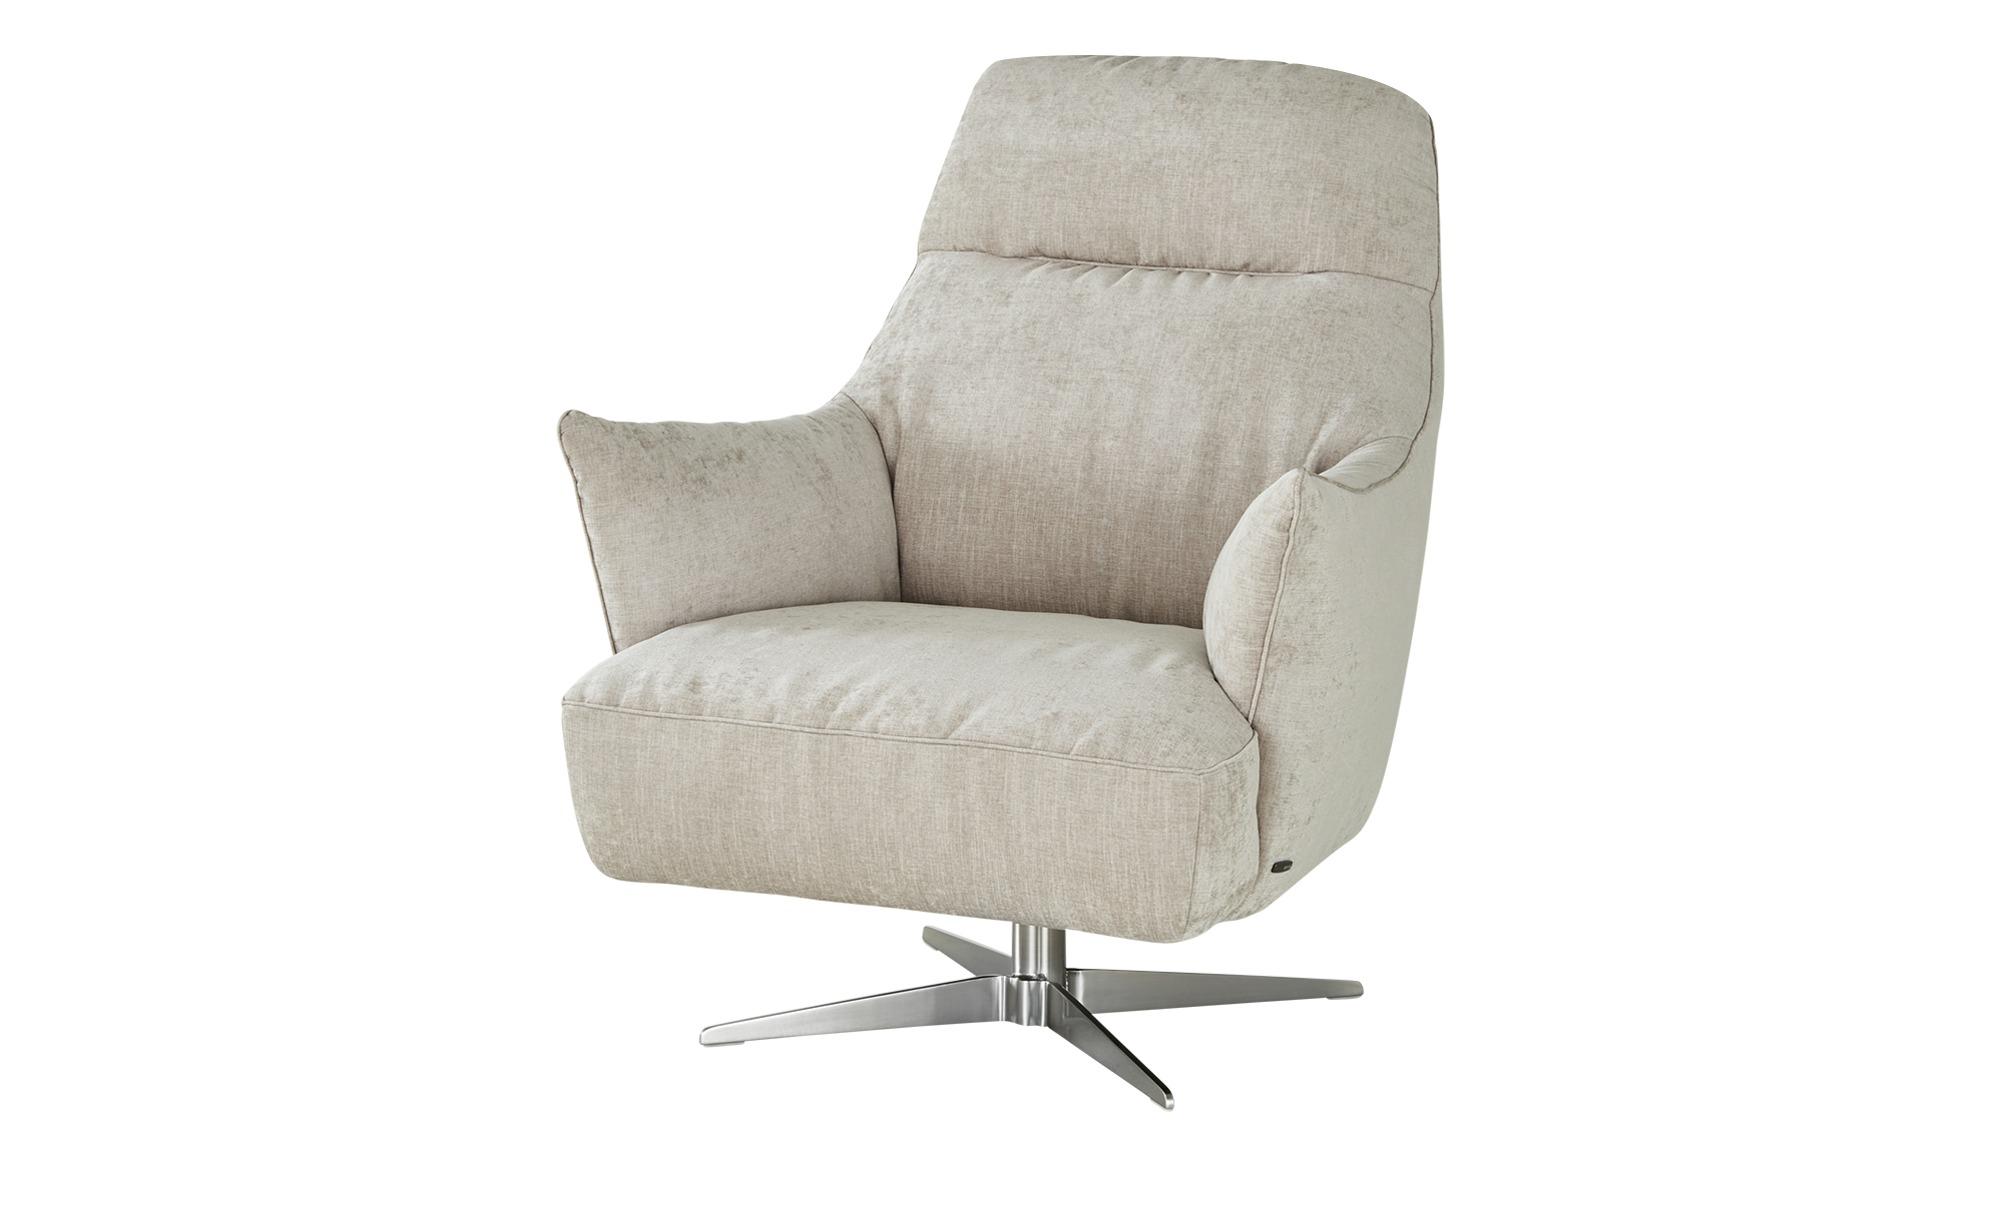 Natuzzi Editions Sessel  Calma ¦ Maße (cm): B: 90 H: 105 T: 91 Polstermöbel > Sessel > Drehsessel - Höffner